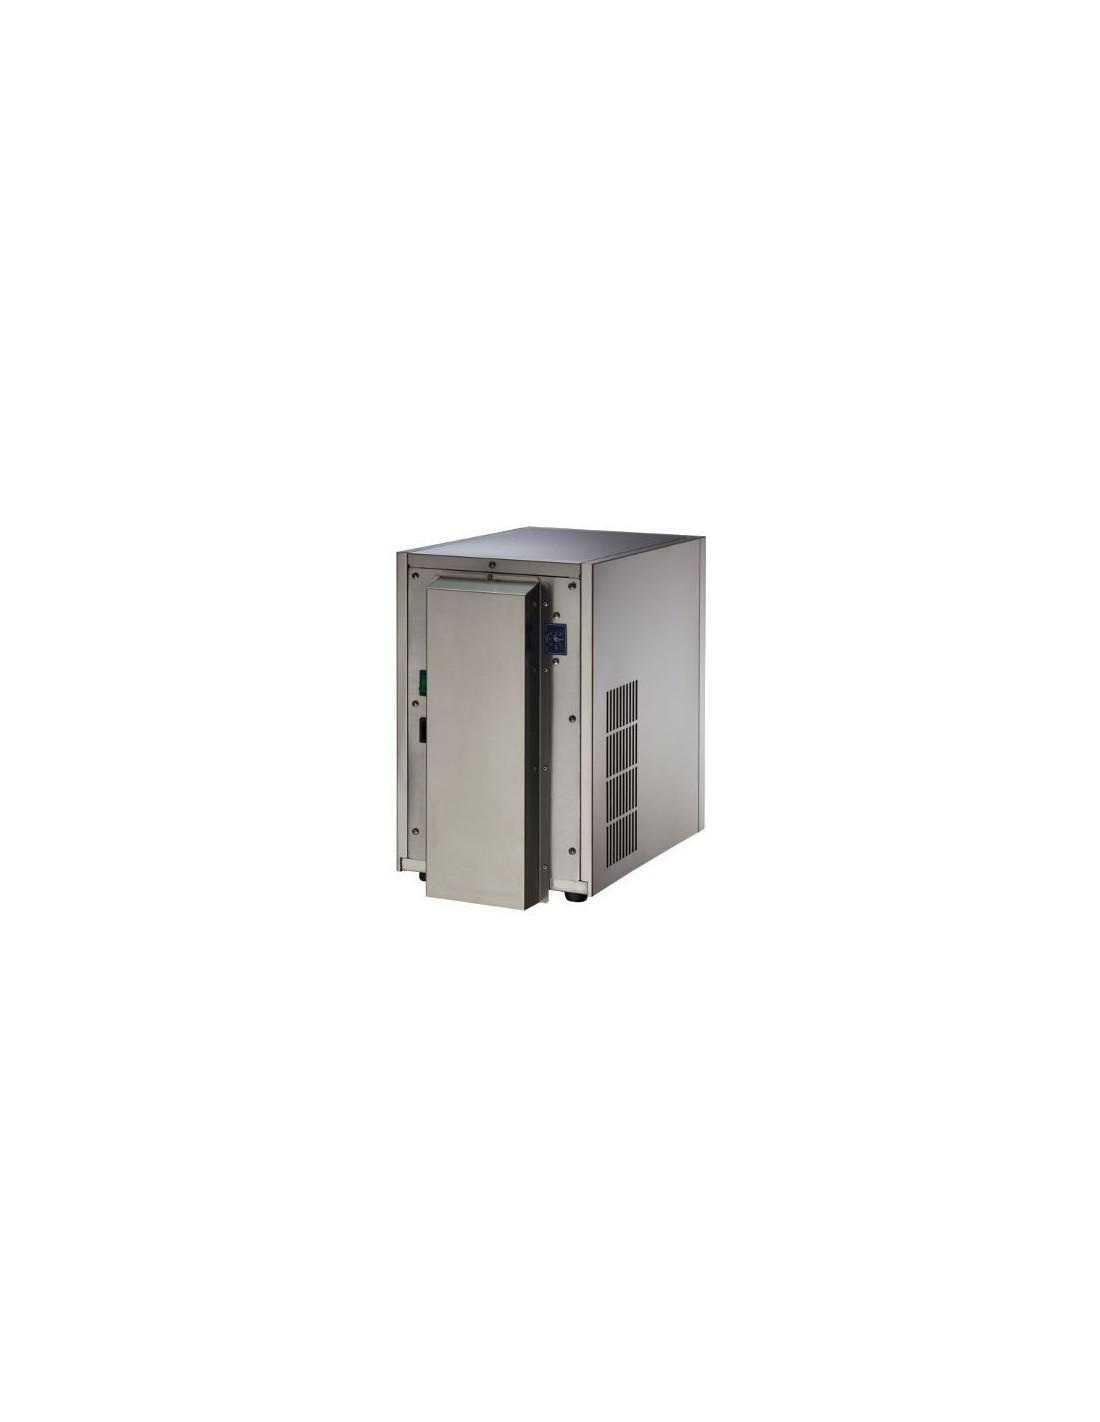 UPP00114 - Kolsyrat vatten - Blupura Blusoda Box Fizz 45